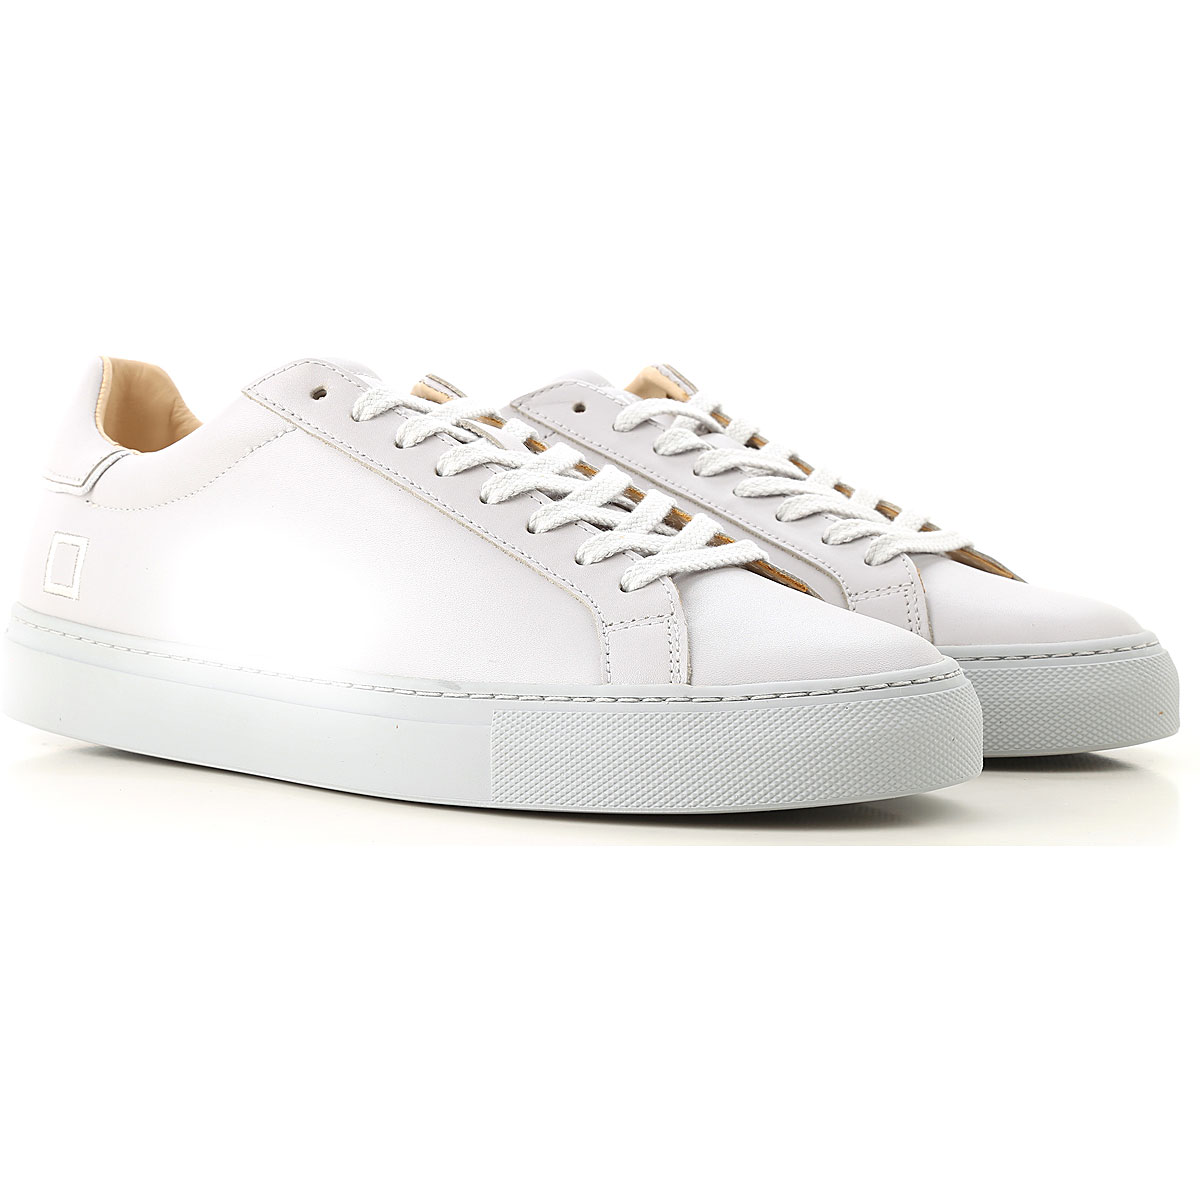 Image of D.A.T.E. Sneakers for Men, Pearl Grey, Leather, 2017, US 8 - EU 41 - UK 7 - JP 26.5 US 9 - EU 42 - UK 8 - JP 27 US 10 - EU 43 - UK 9 - JP 27.5 US 11 - EU 44 - UK 10 - JP 28 US 12 - EU 45 - UK 11 - JP 28.5